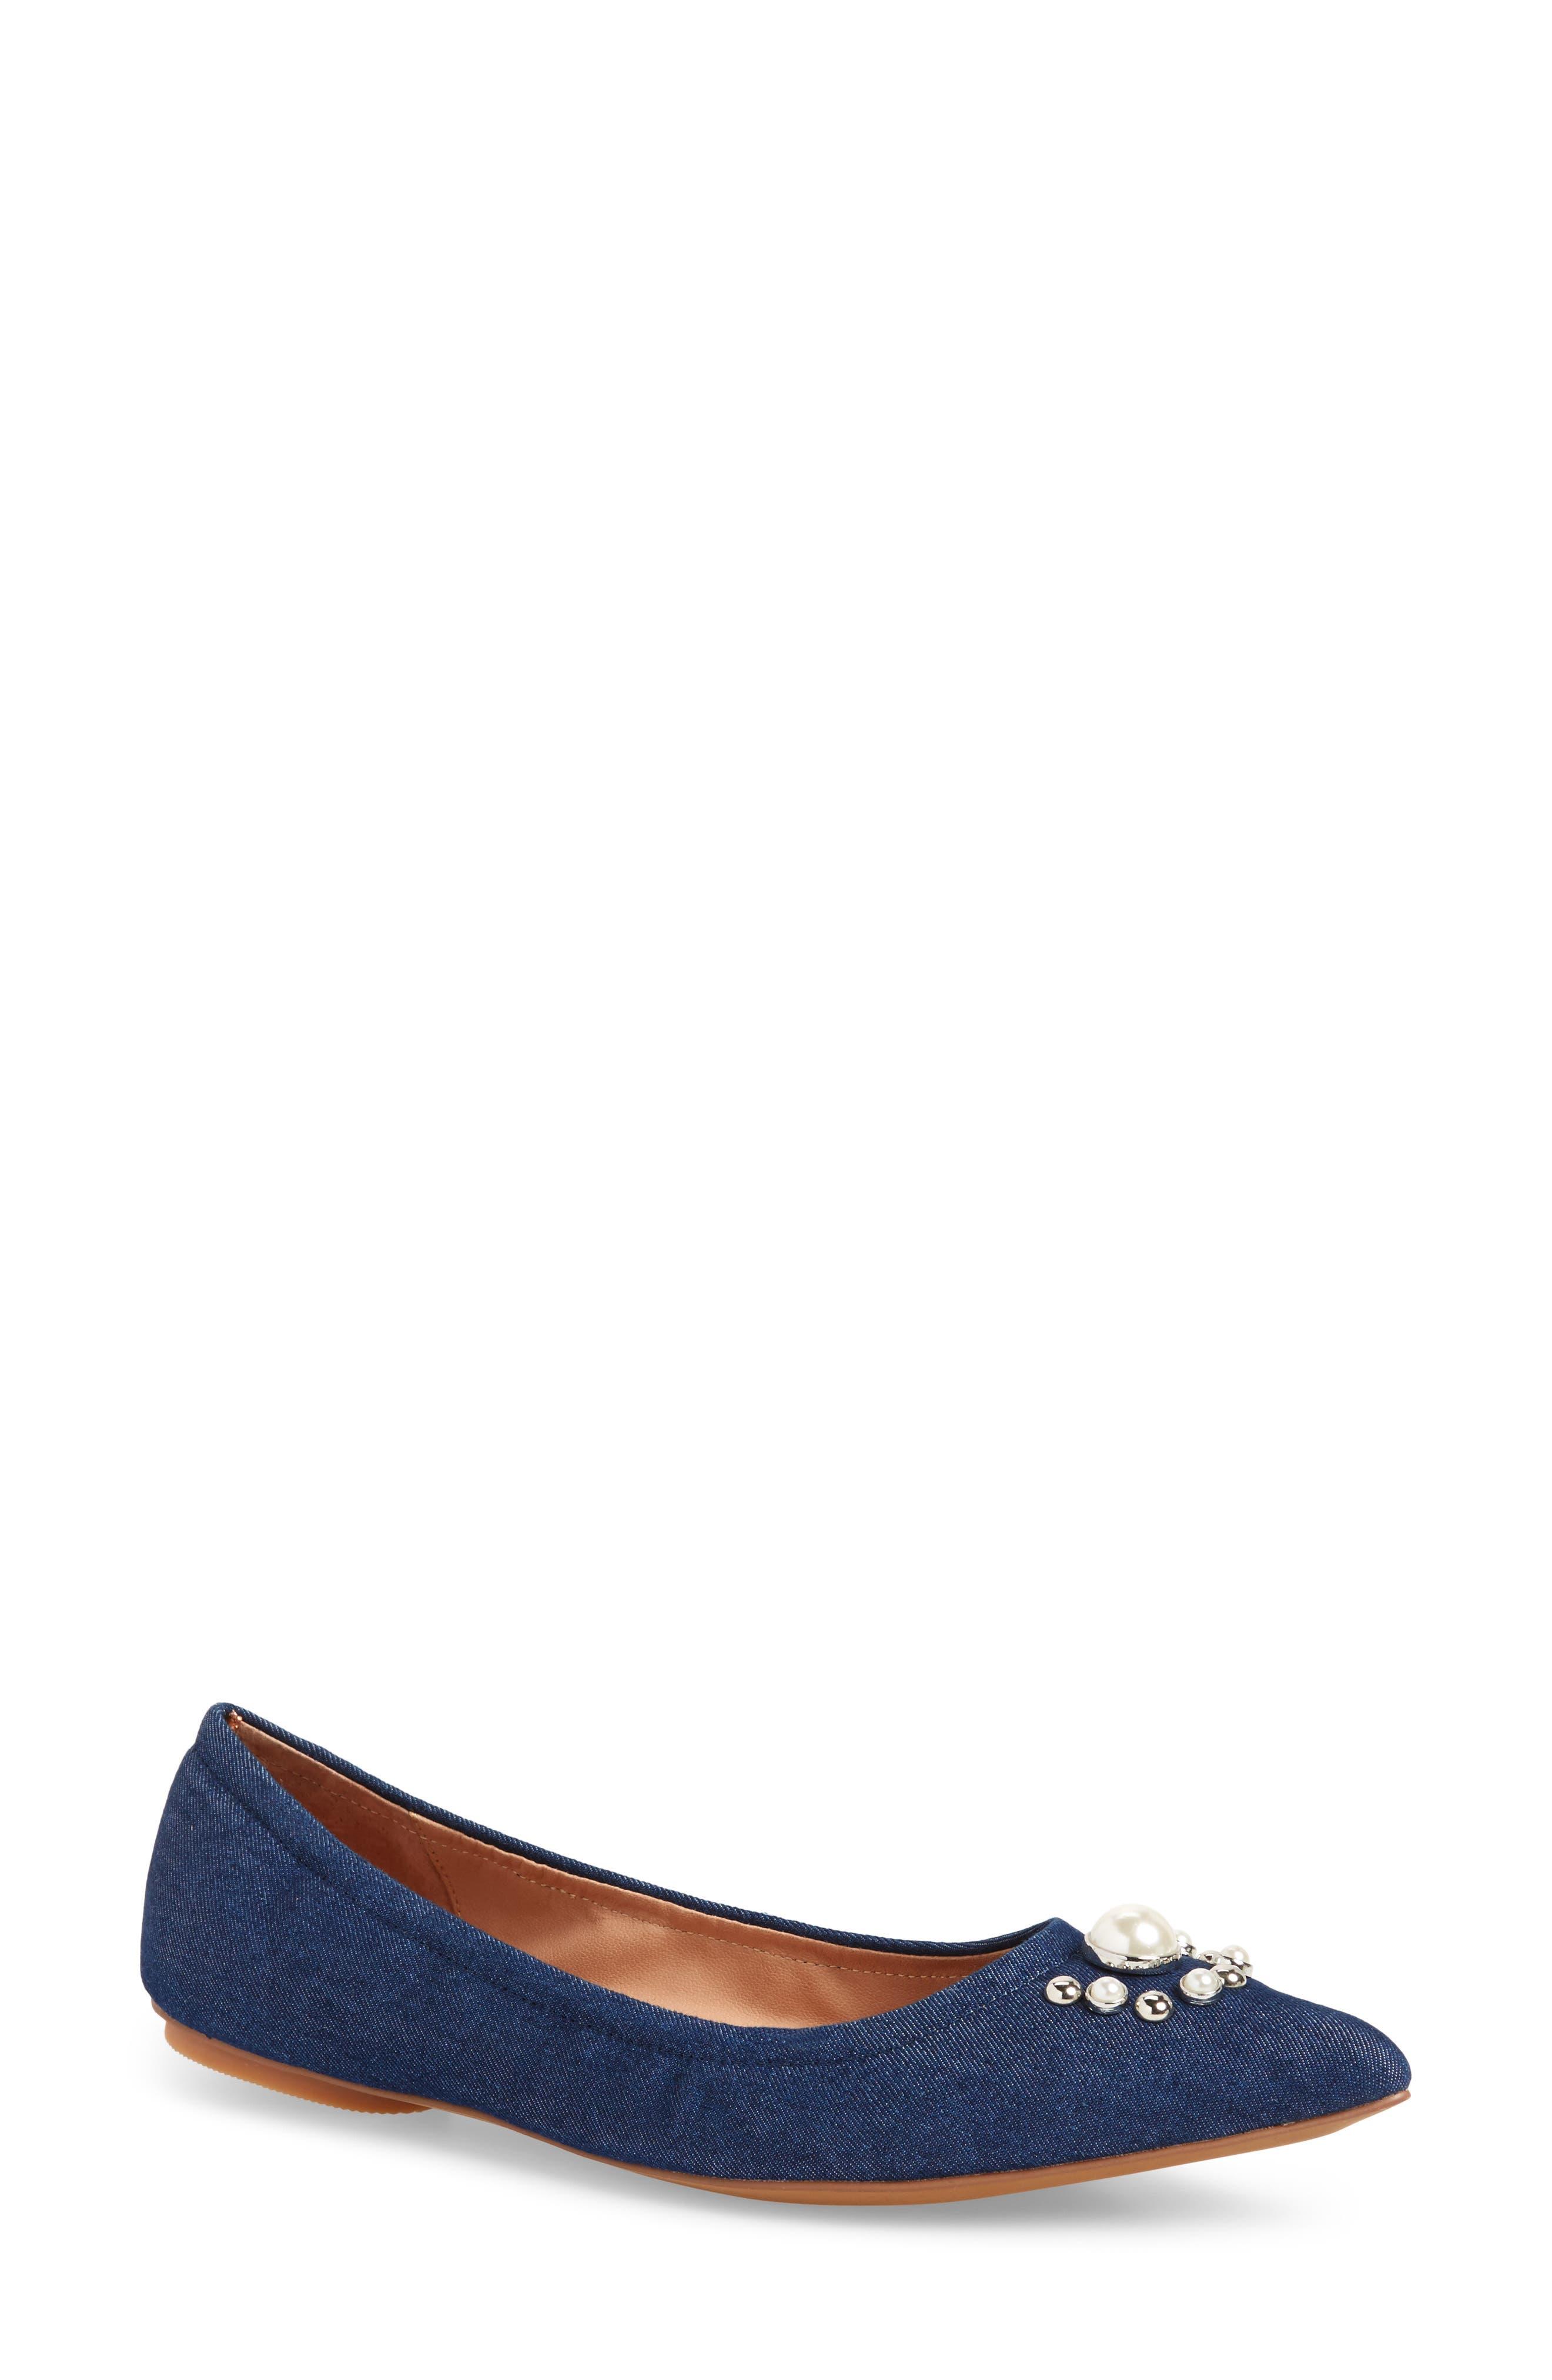 Linea Paolo Nadia Embellished Pointy Toe Flat- Blue